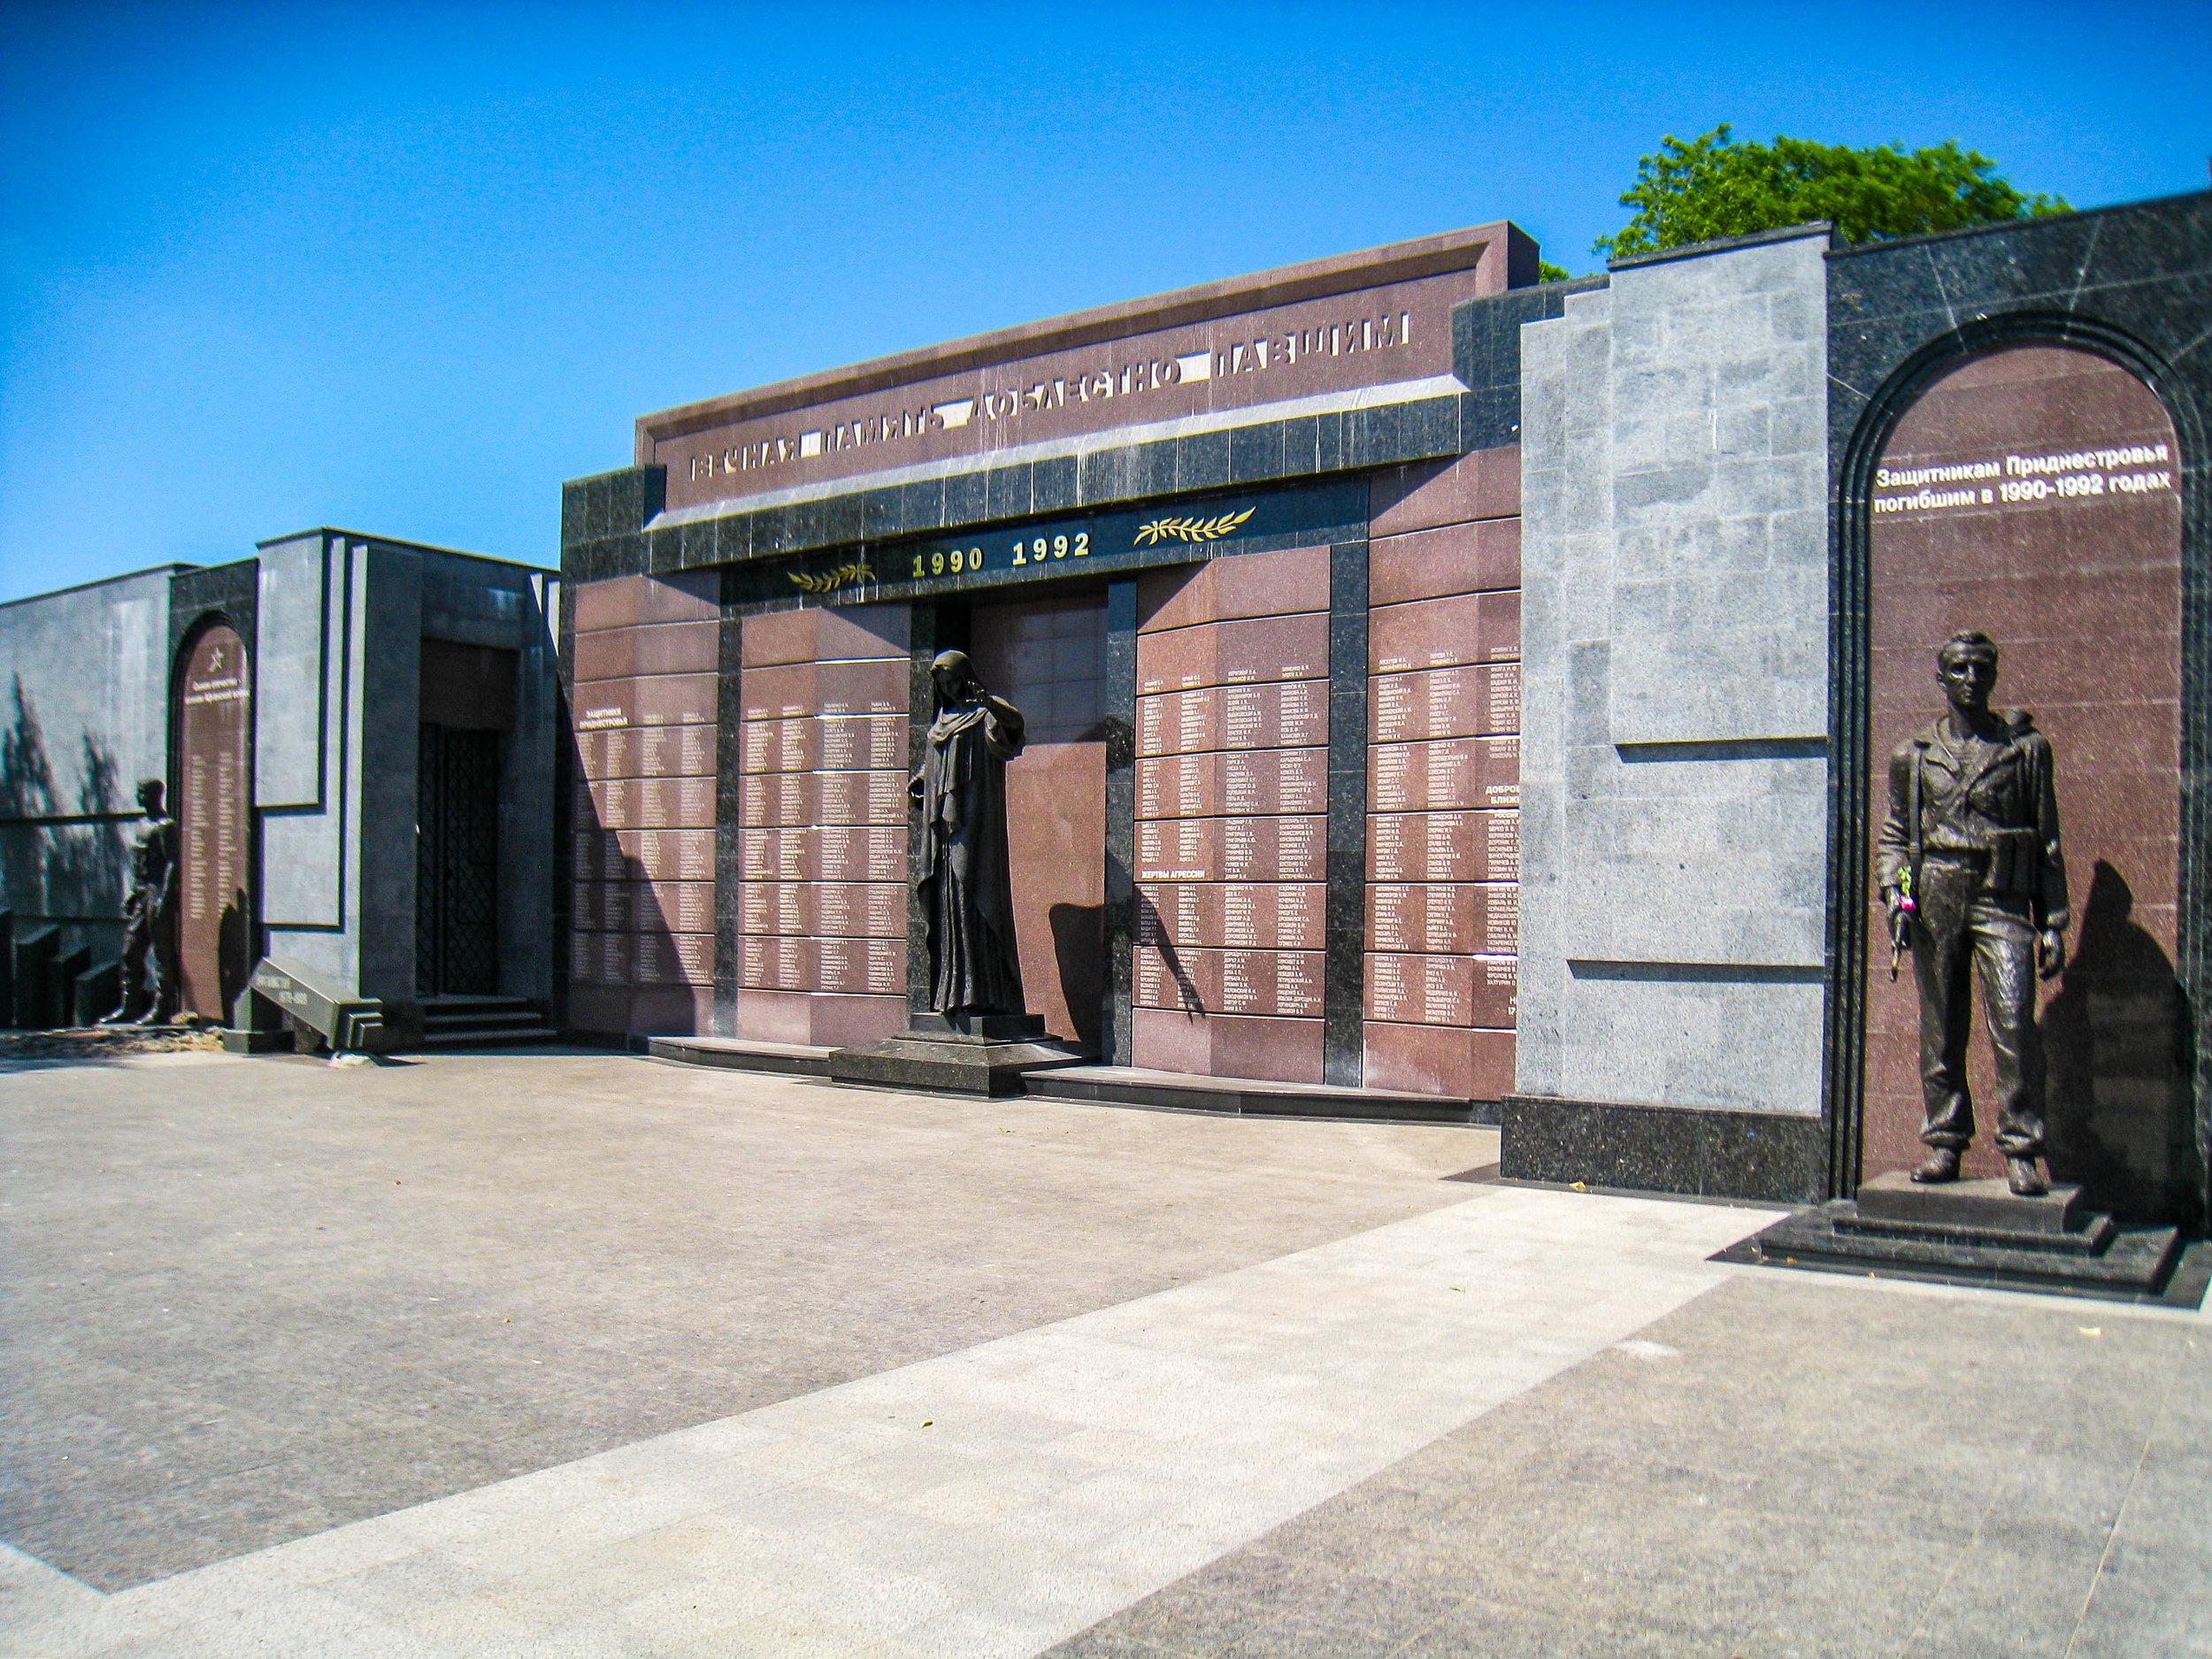 Transnistria War Monument